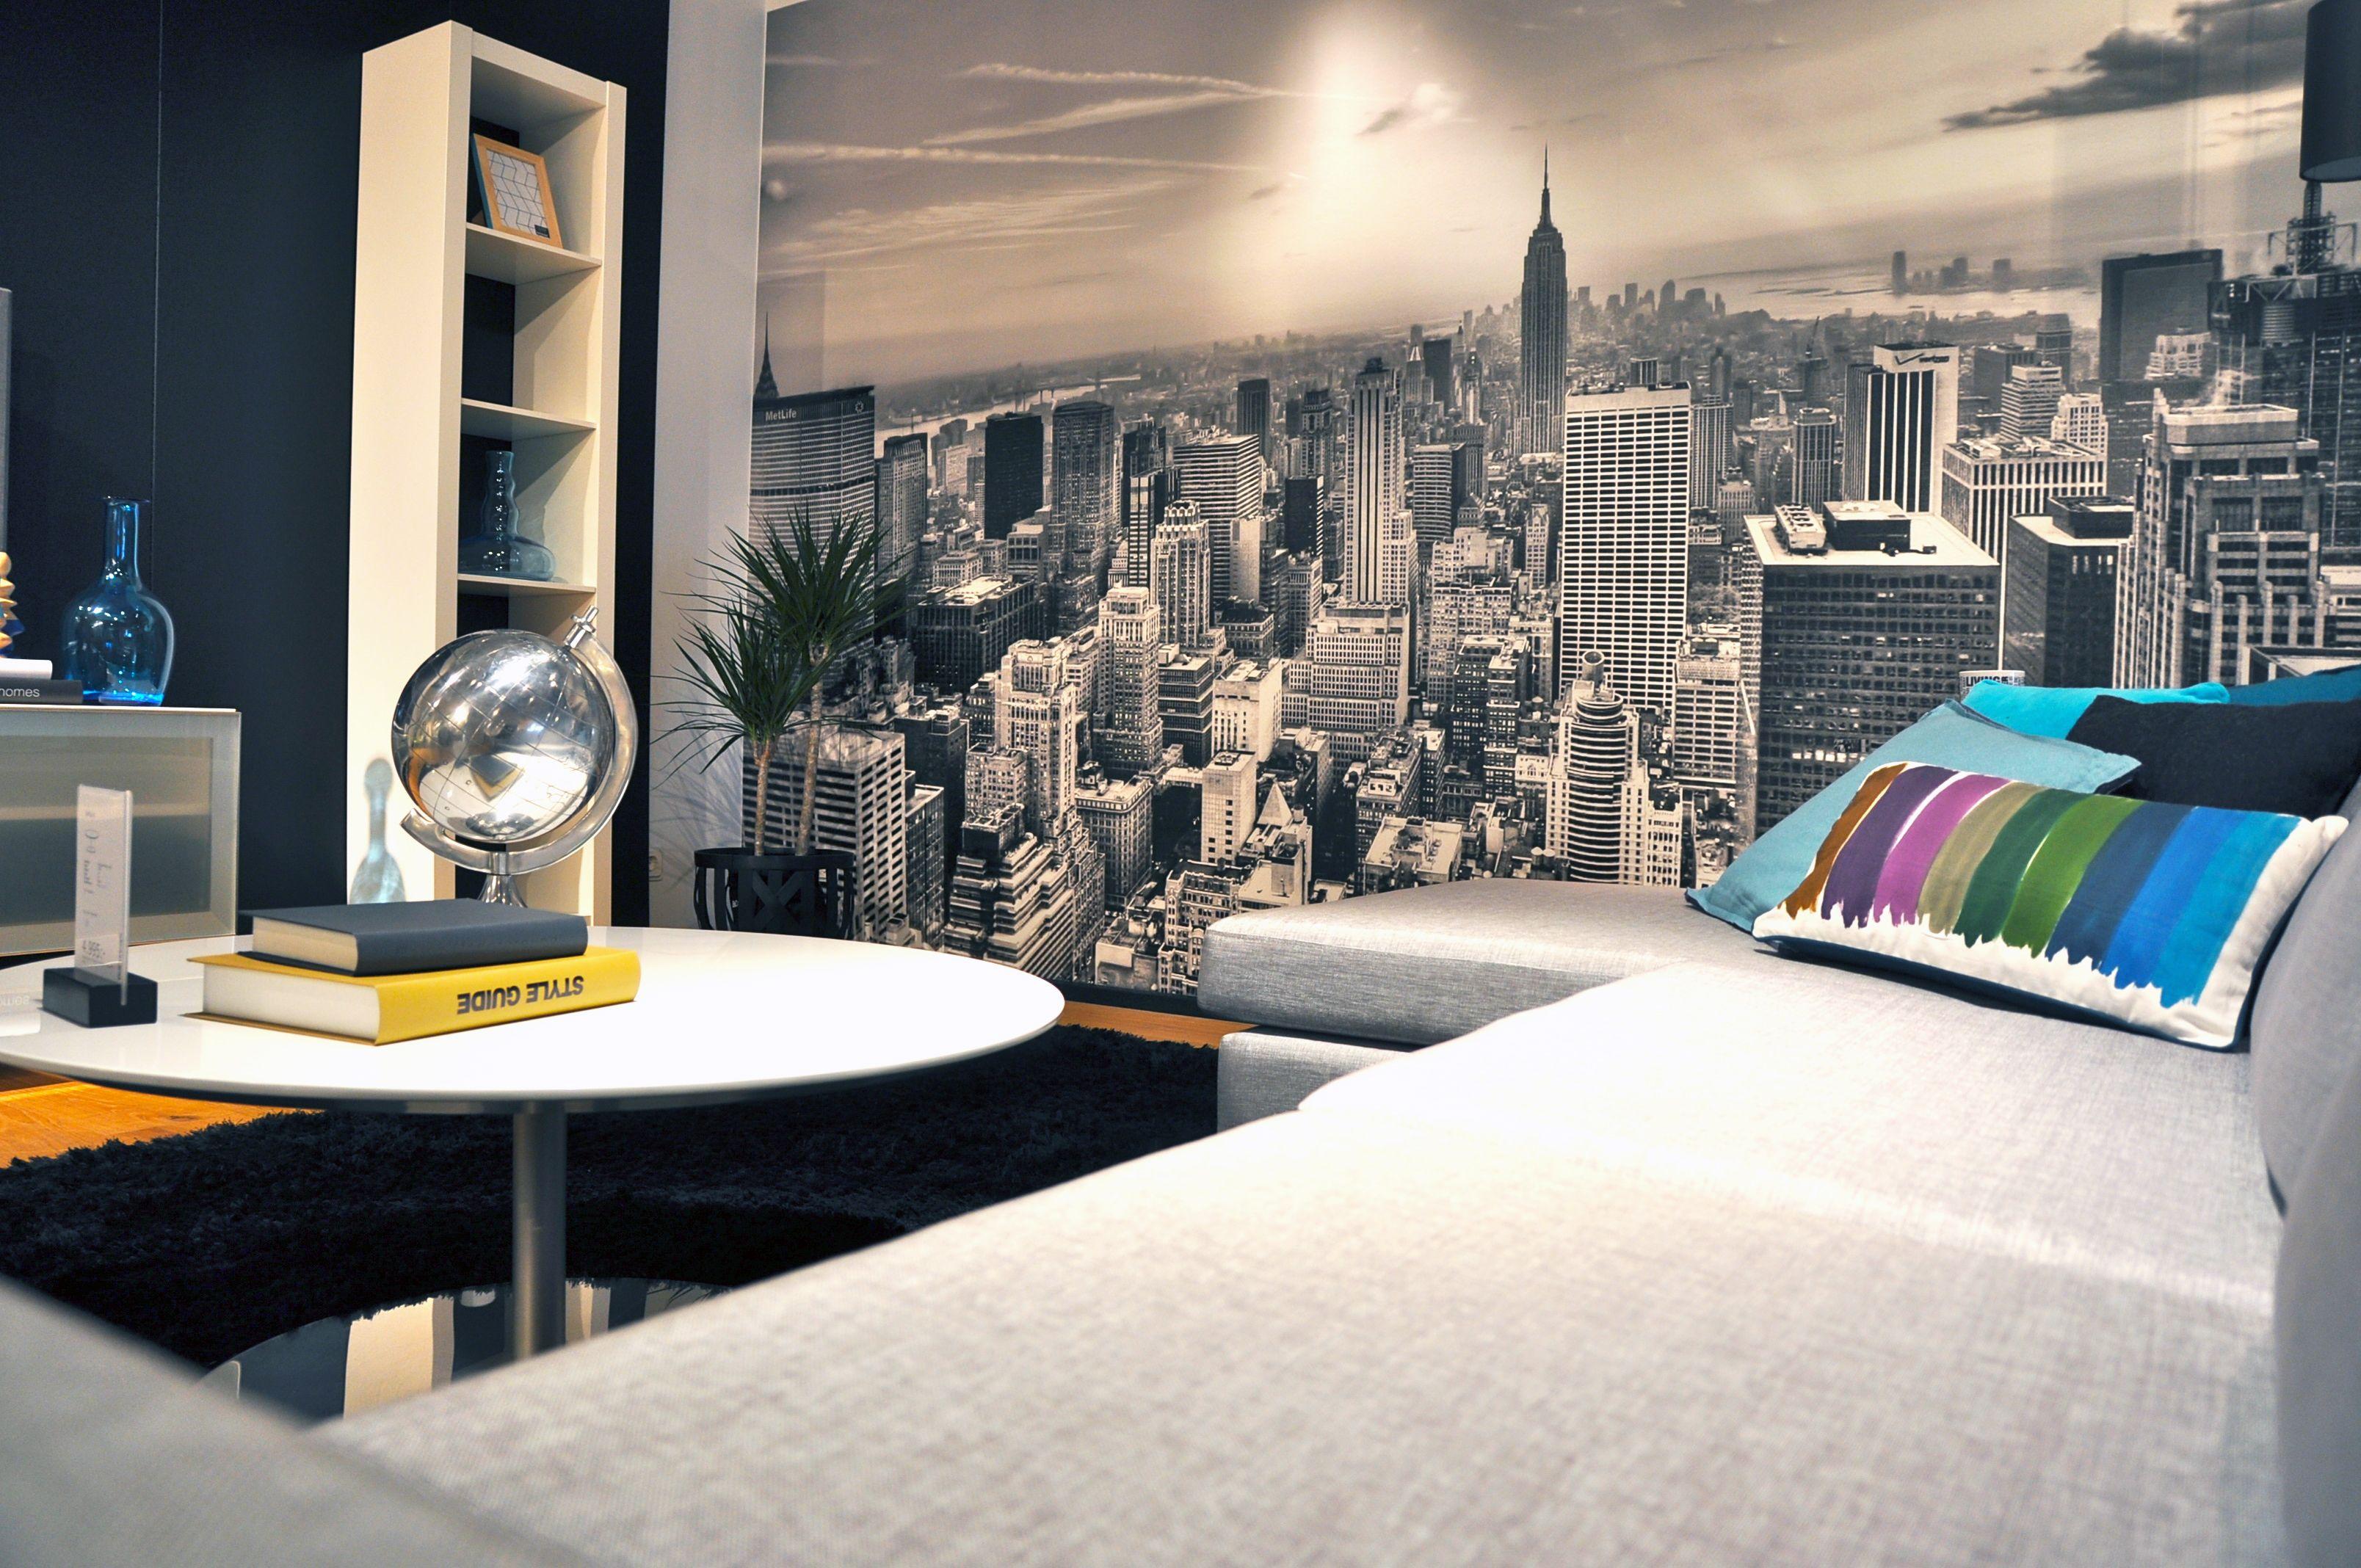 New York City 2 B W Wall Mural Wallpaper Photowall Home Decor Fototapet Valokuvatapetit Nyc Interior Design Decor Home Decor Bedroom